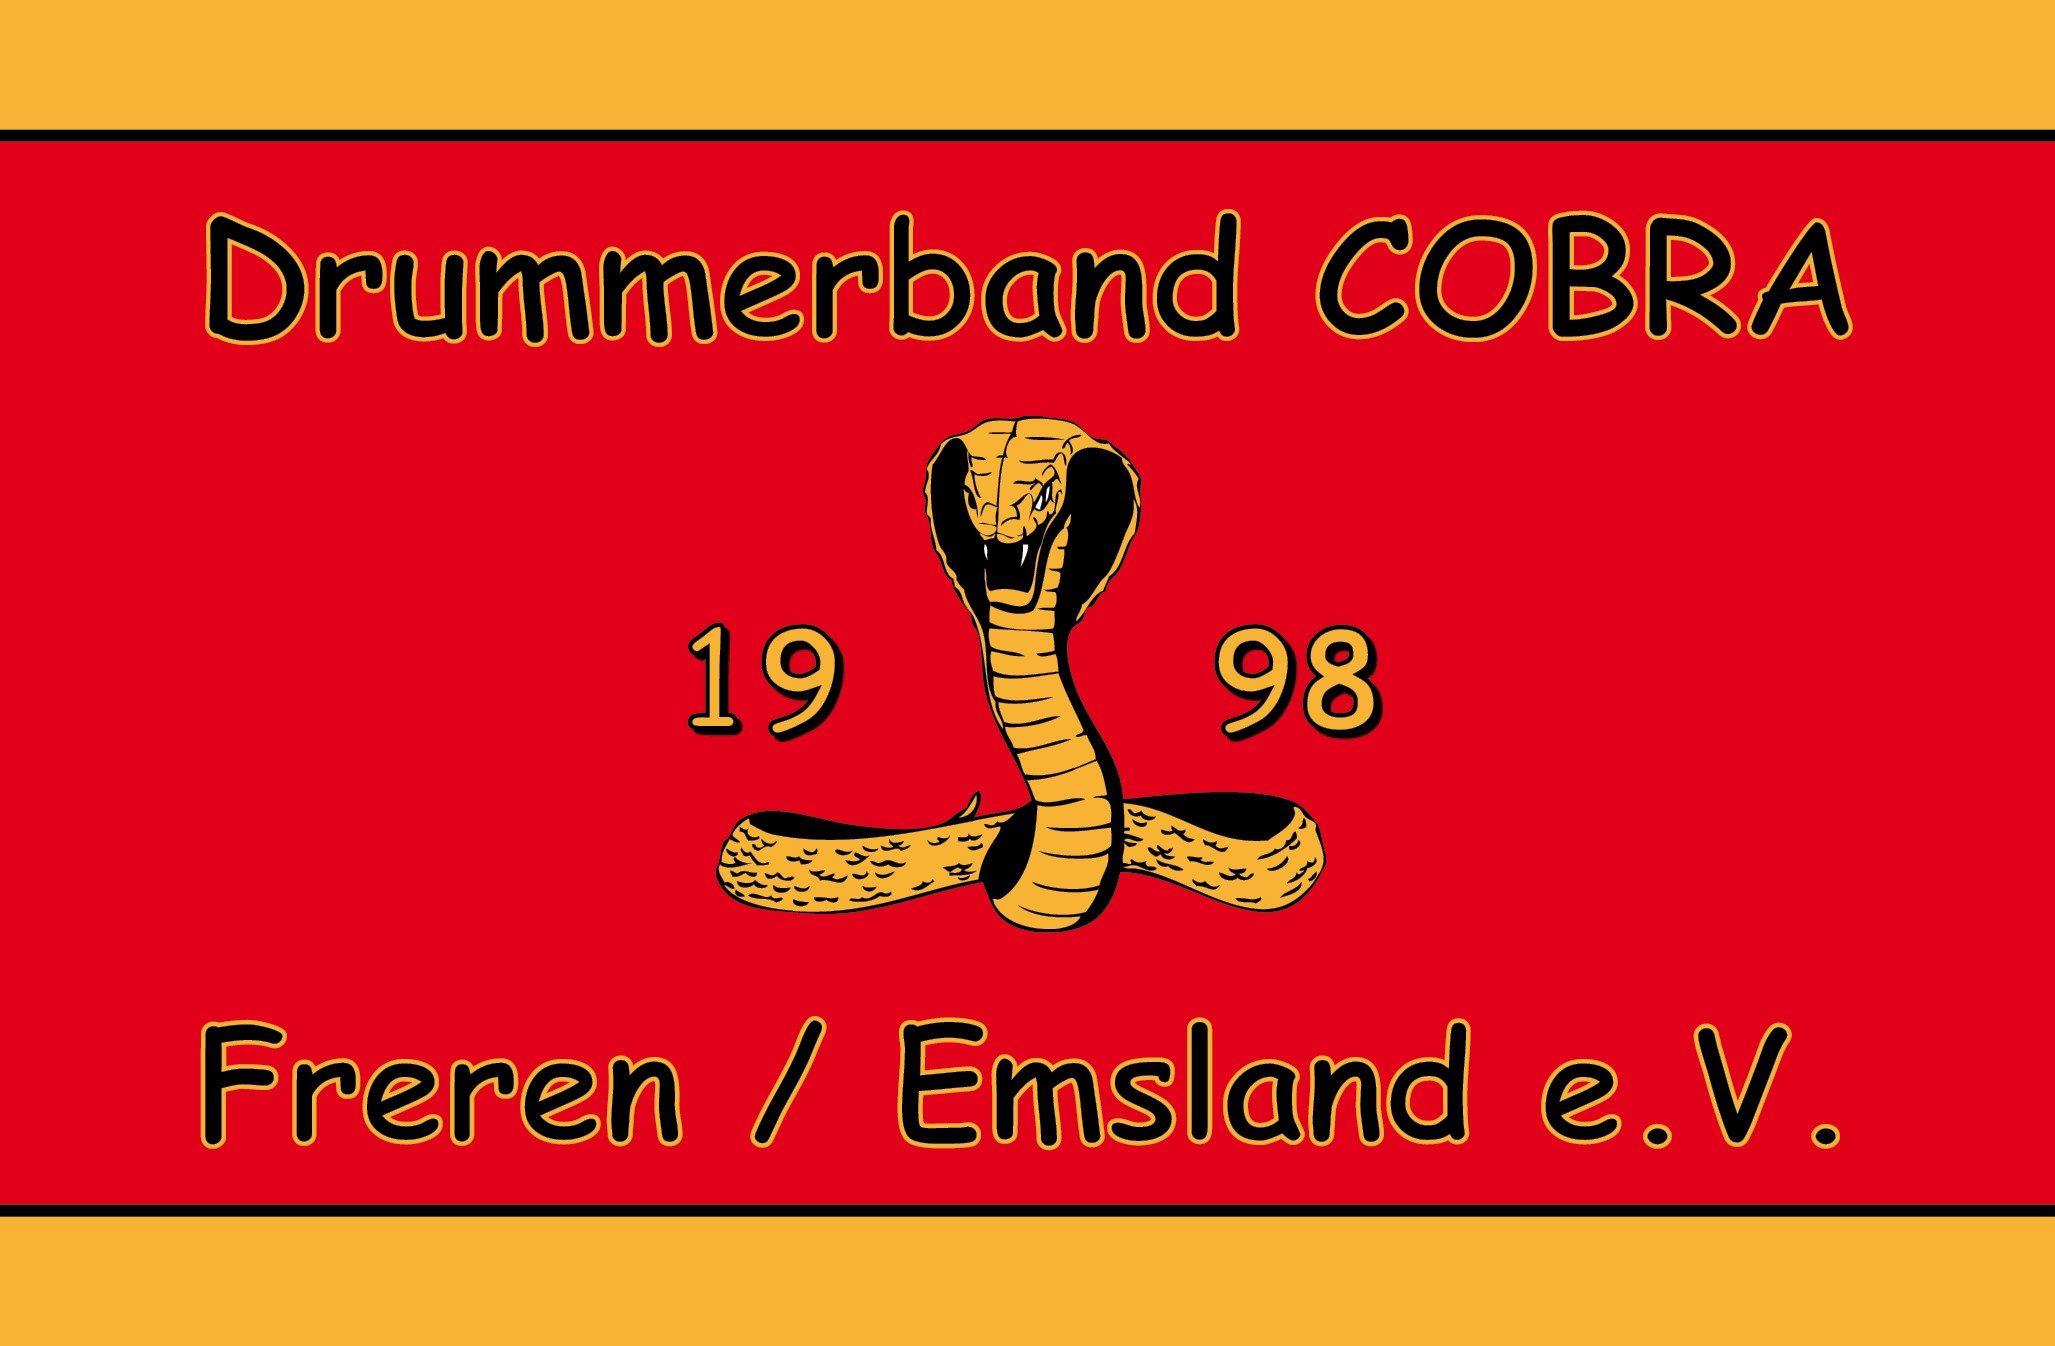 Drummerband Cobra